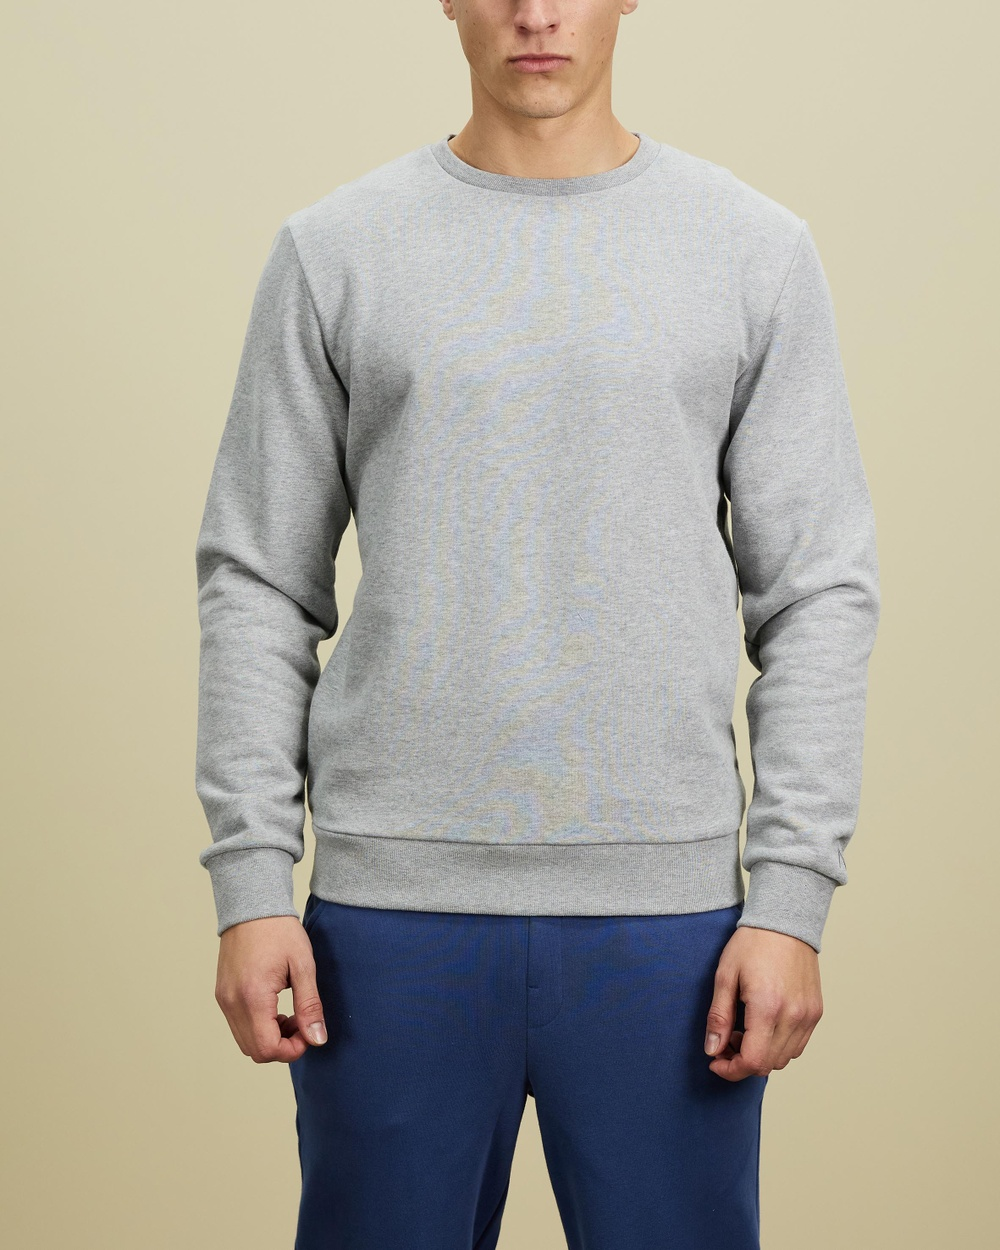 AERE Organic Cotton Crew Sweat Sweats Grey Marle